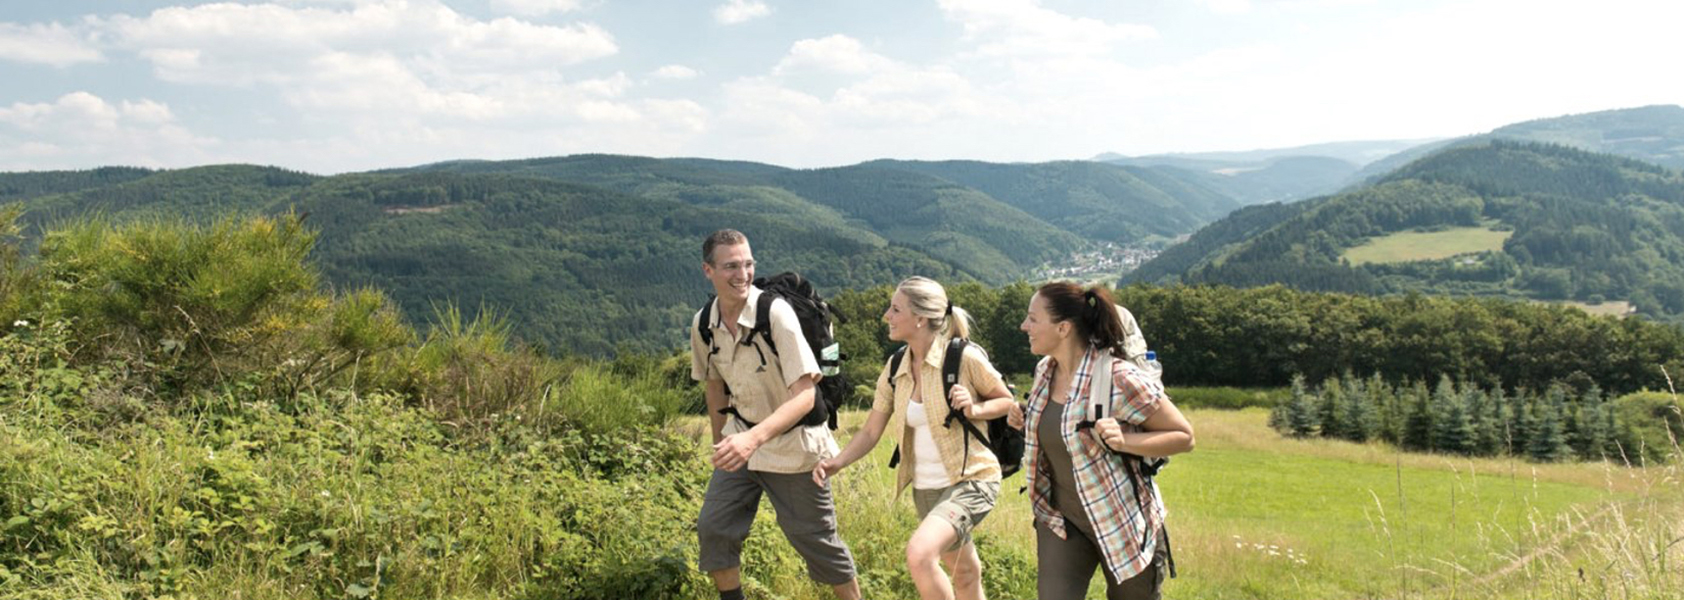 Single Reis Duitsland | Wandelen over de rotweinwanderweg